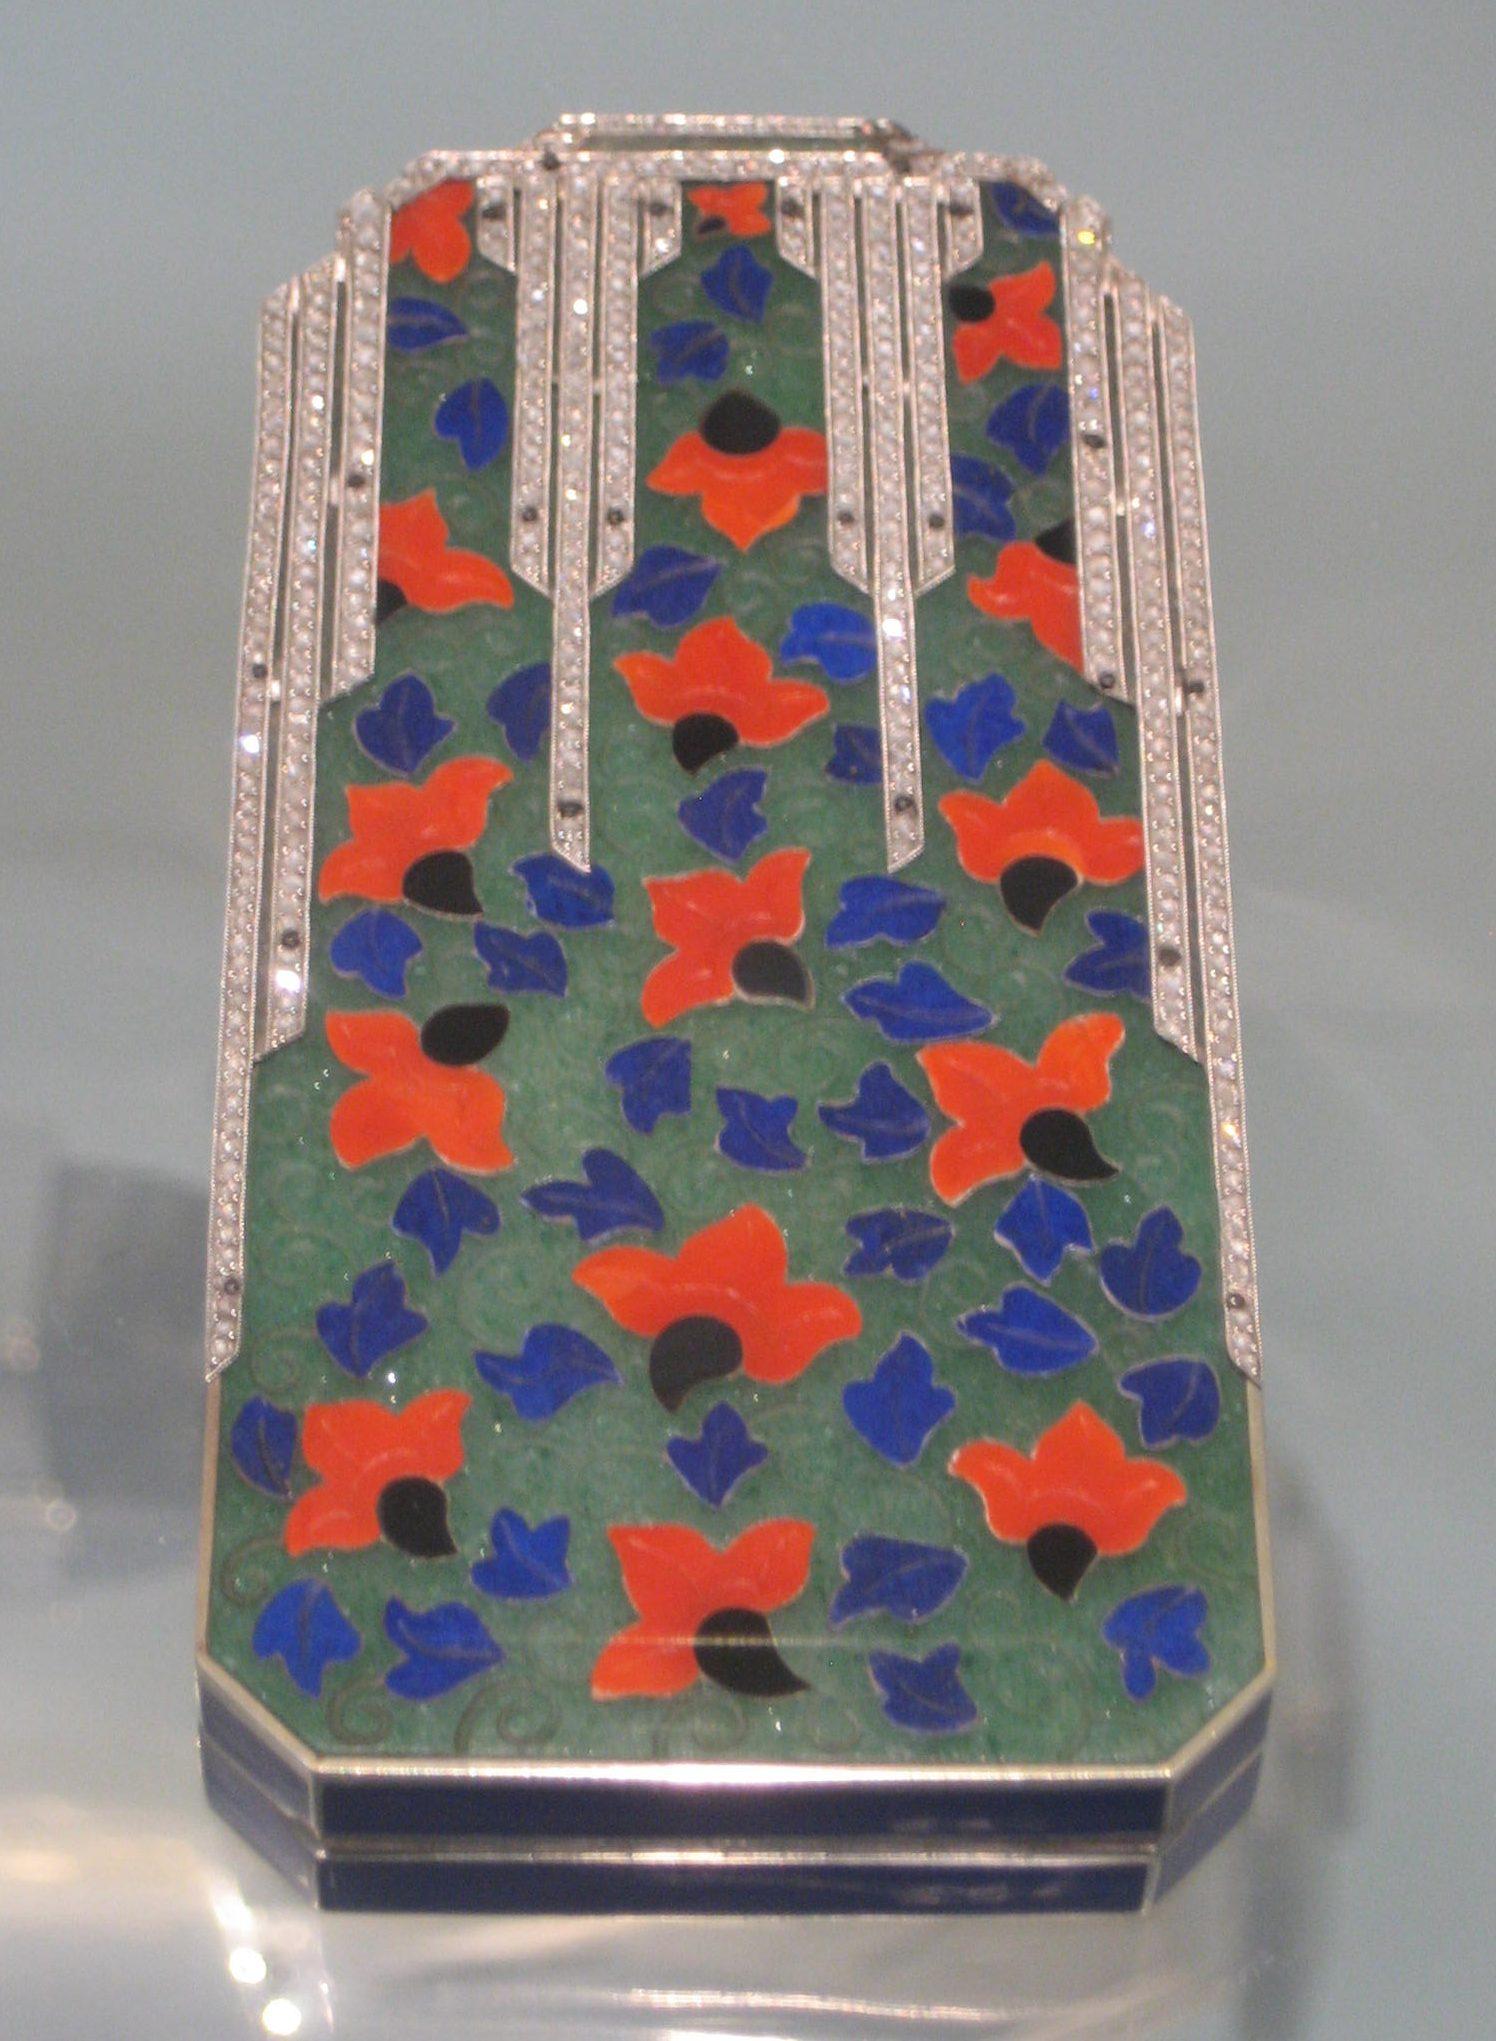 Lacloche Frères, make-up etui, circa 1925. Collectie Badisches Landesmuseum, 74/97, diamanten, metaal